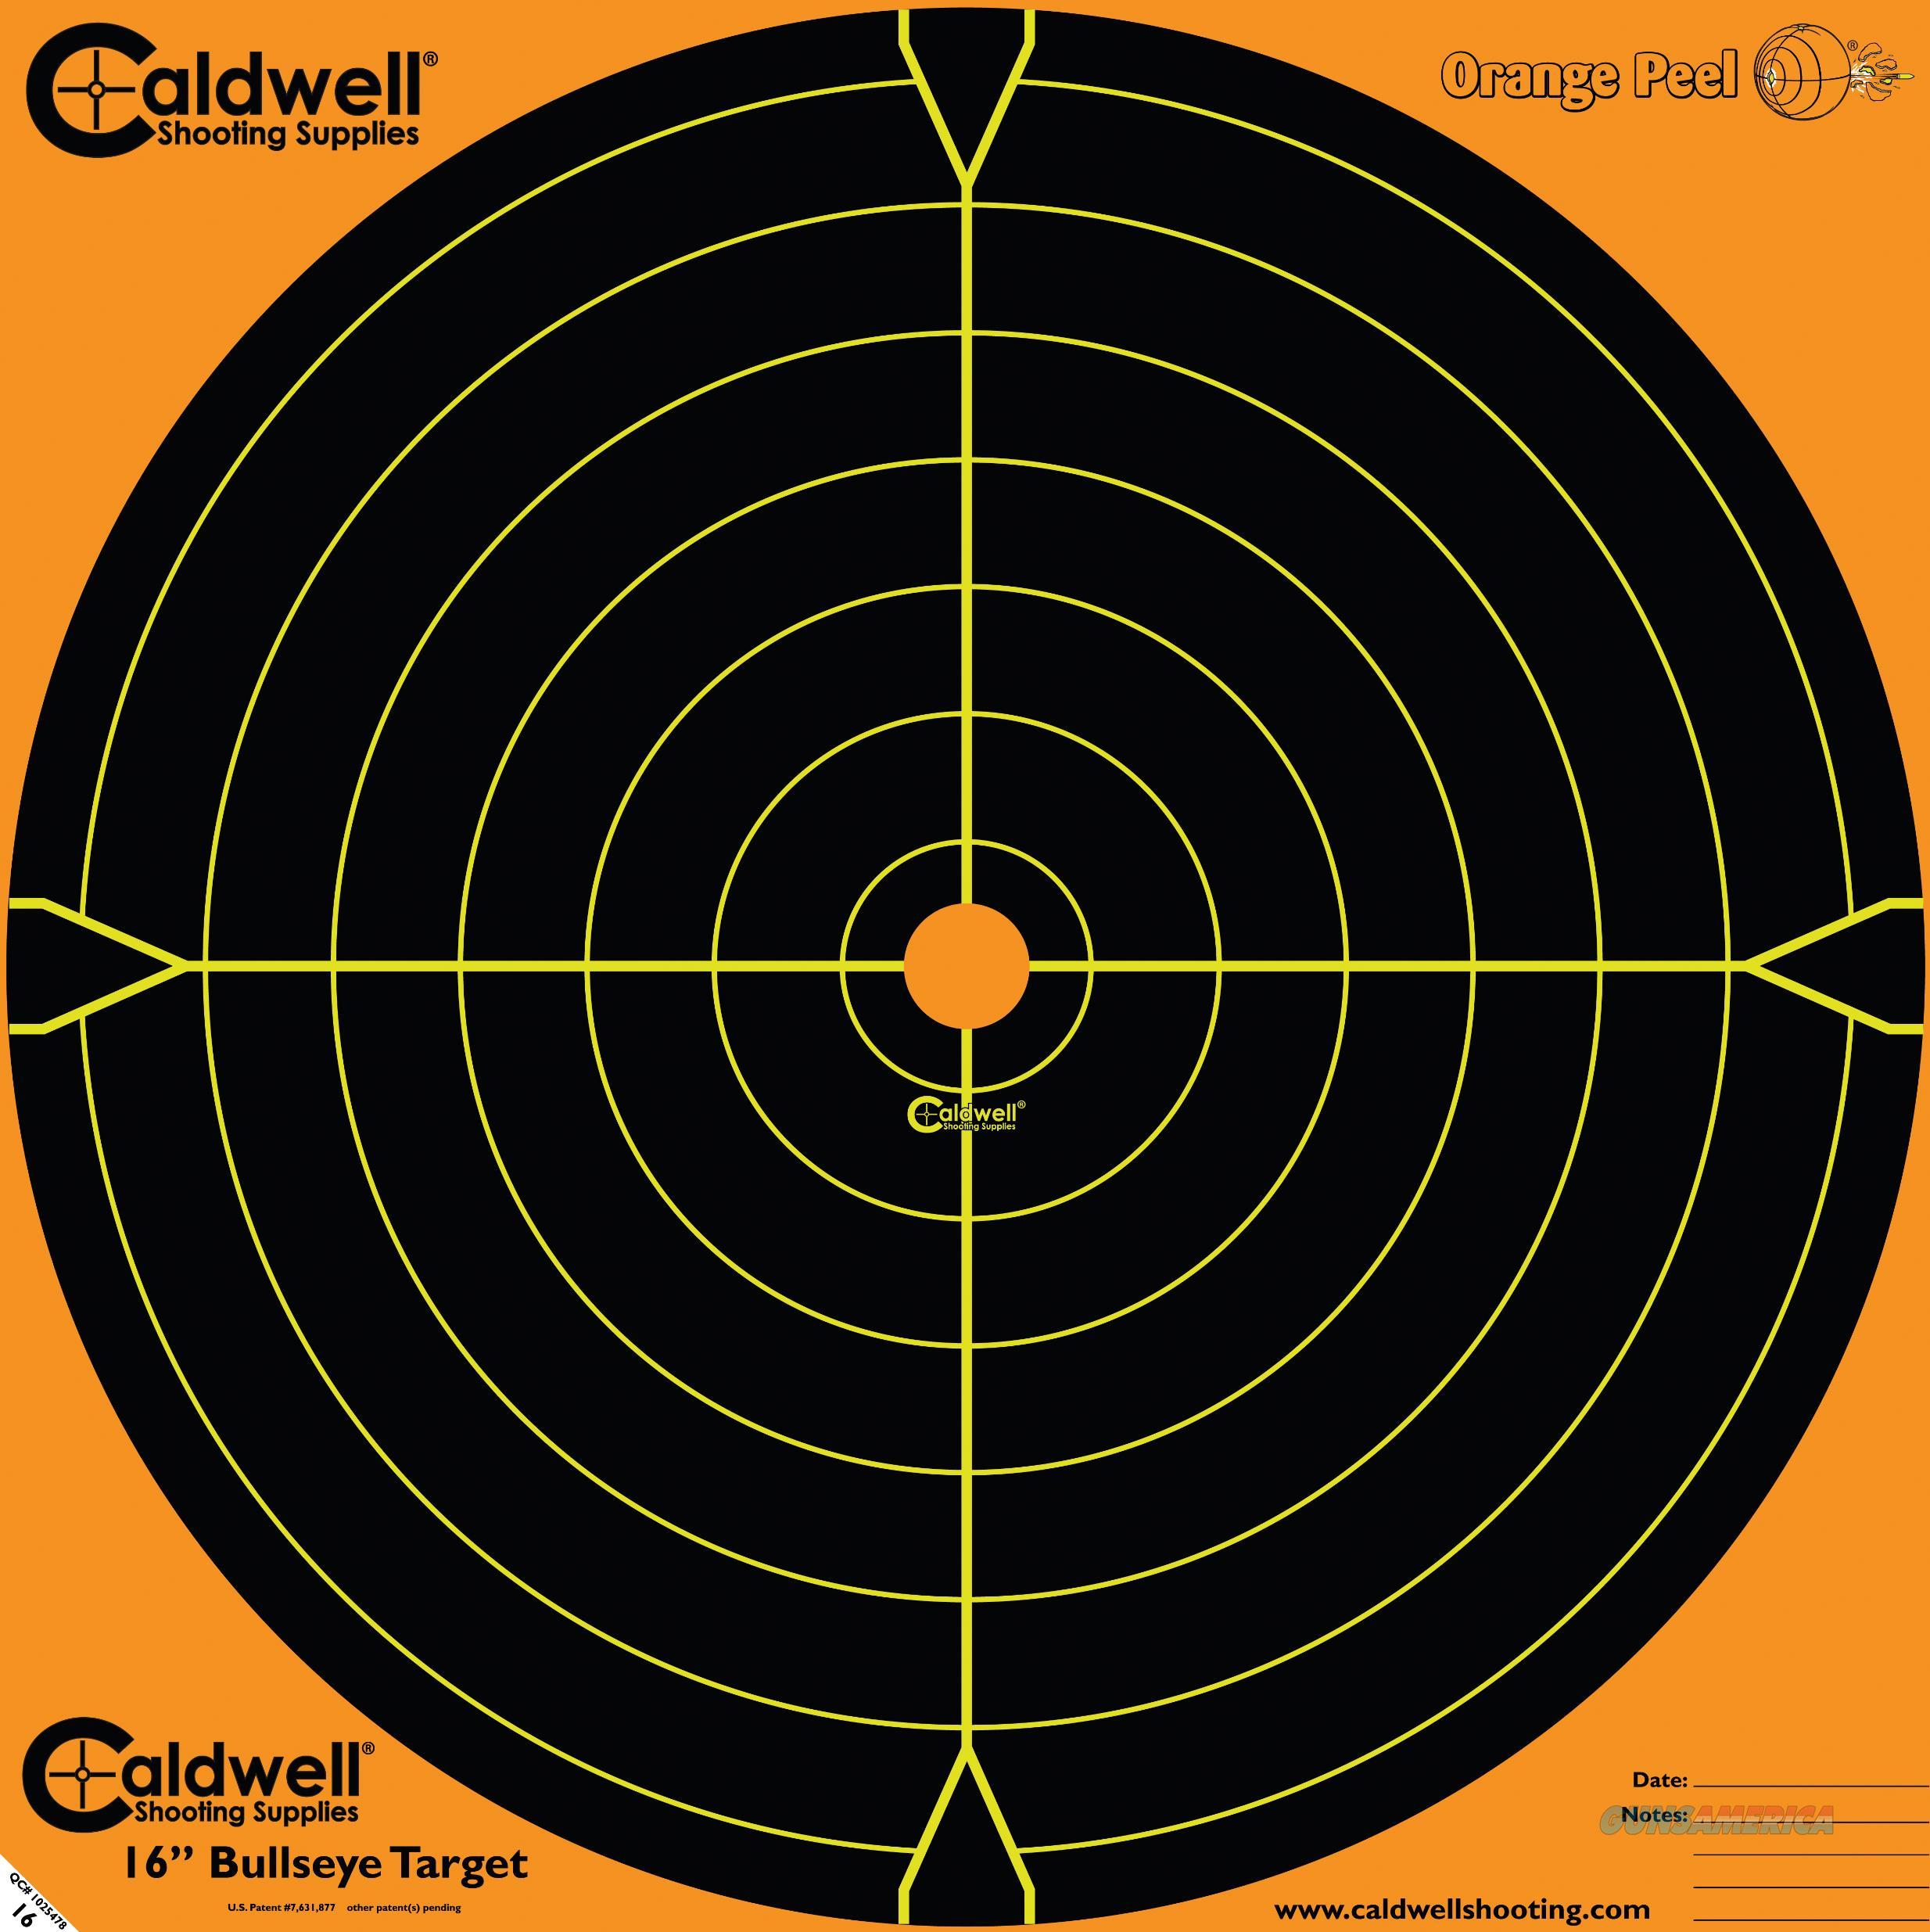 Caldwell Orange Peel, Cald 495253  16in Op Sight-in Trgt 5pk  Guns > Pistols > 1911 Pistol Copies (non-Colt)